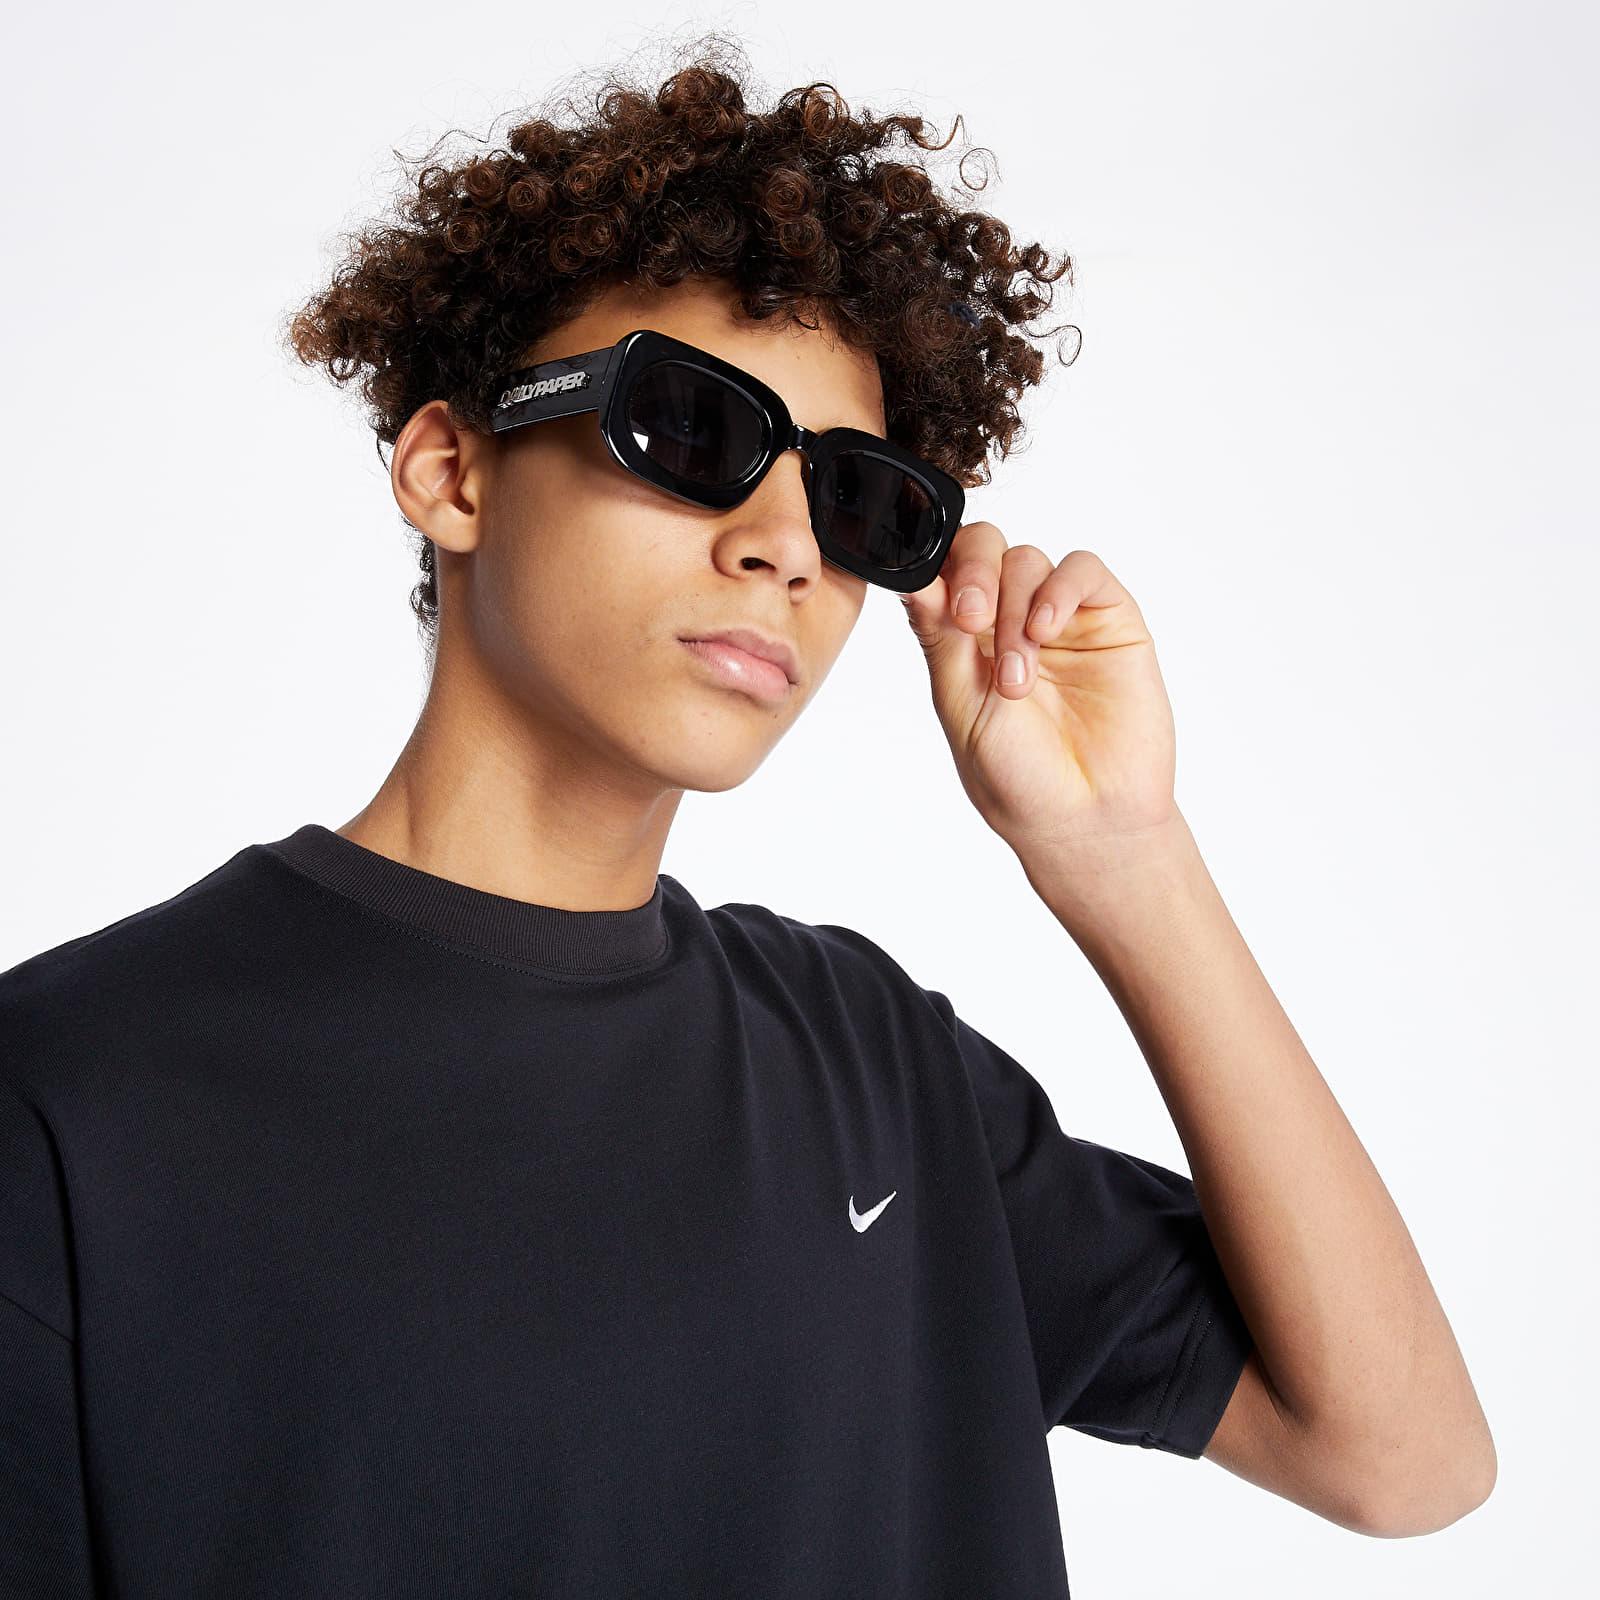 NikeLab Tee Black/ White S